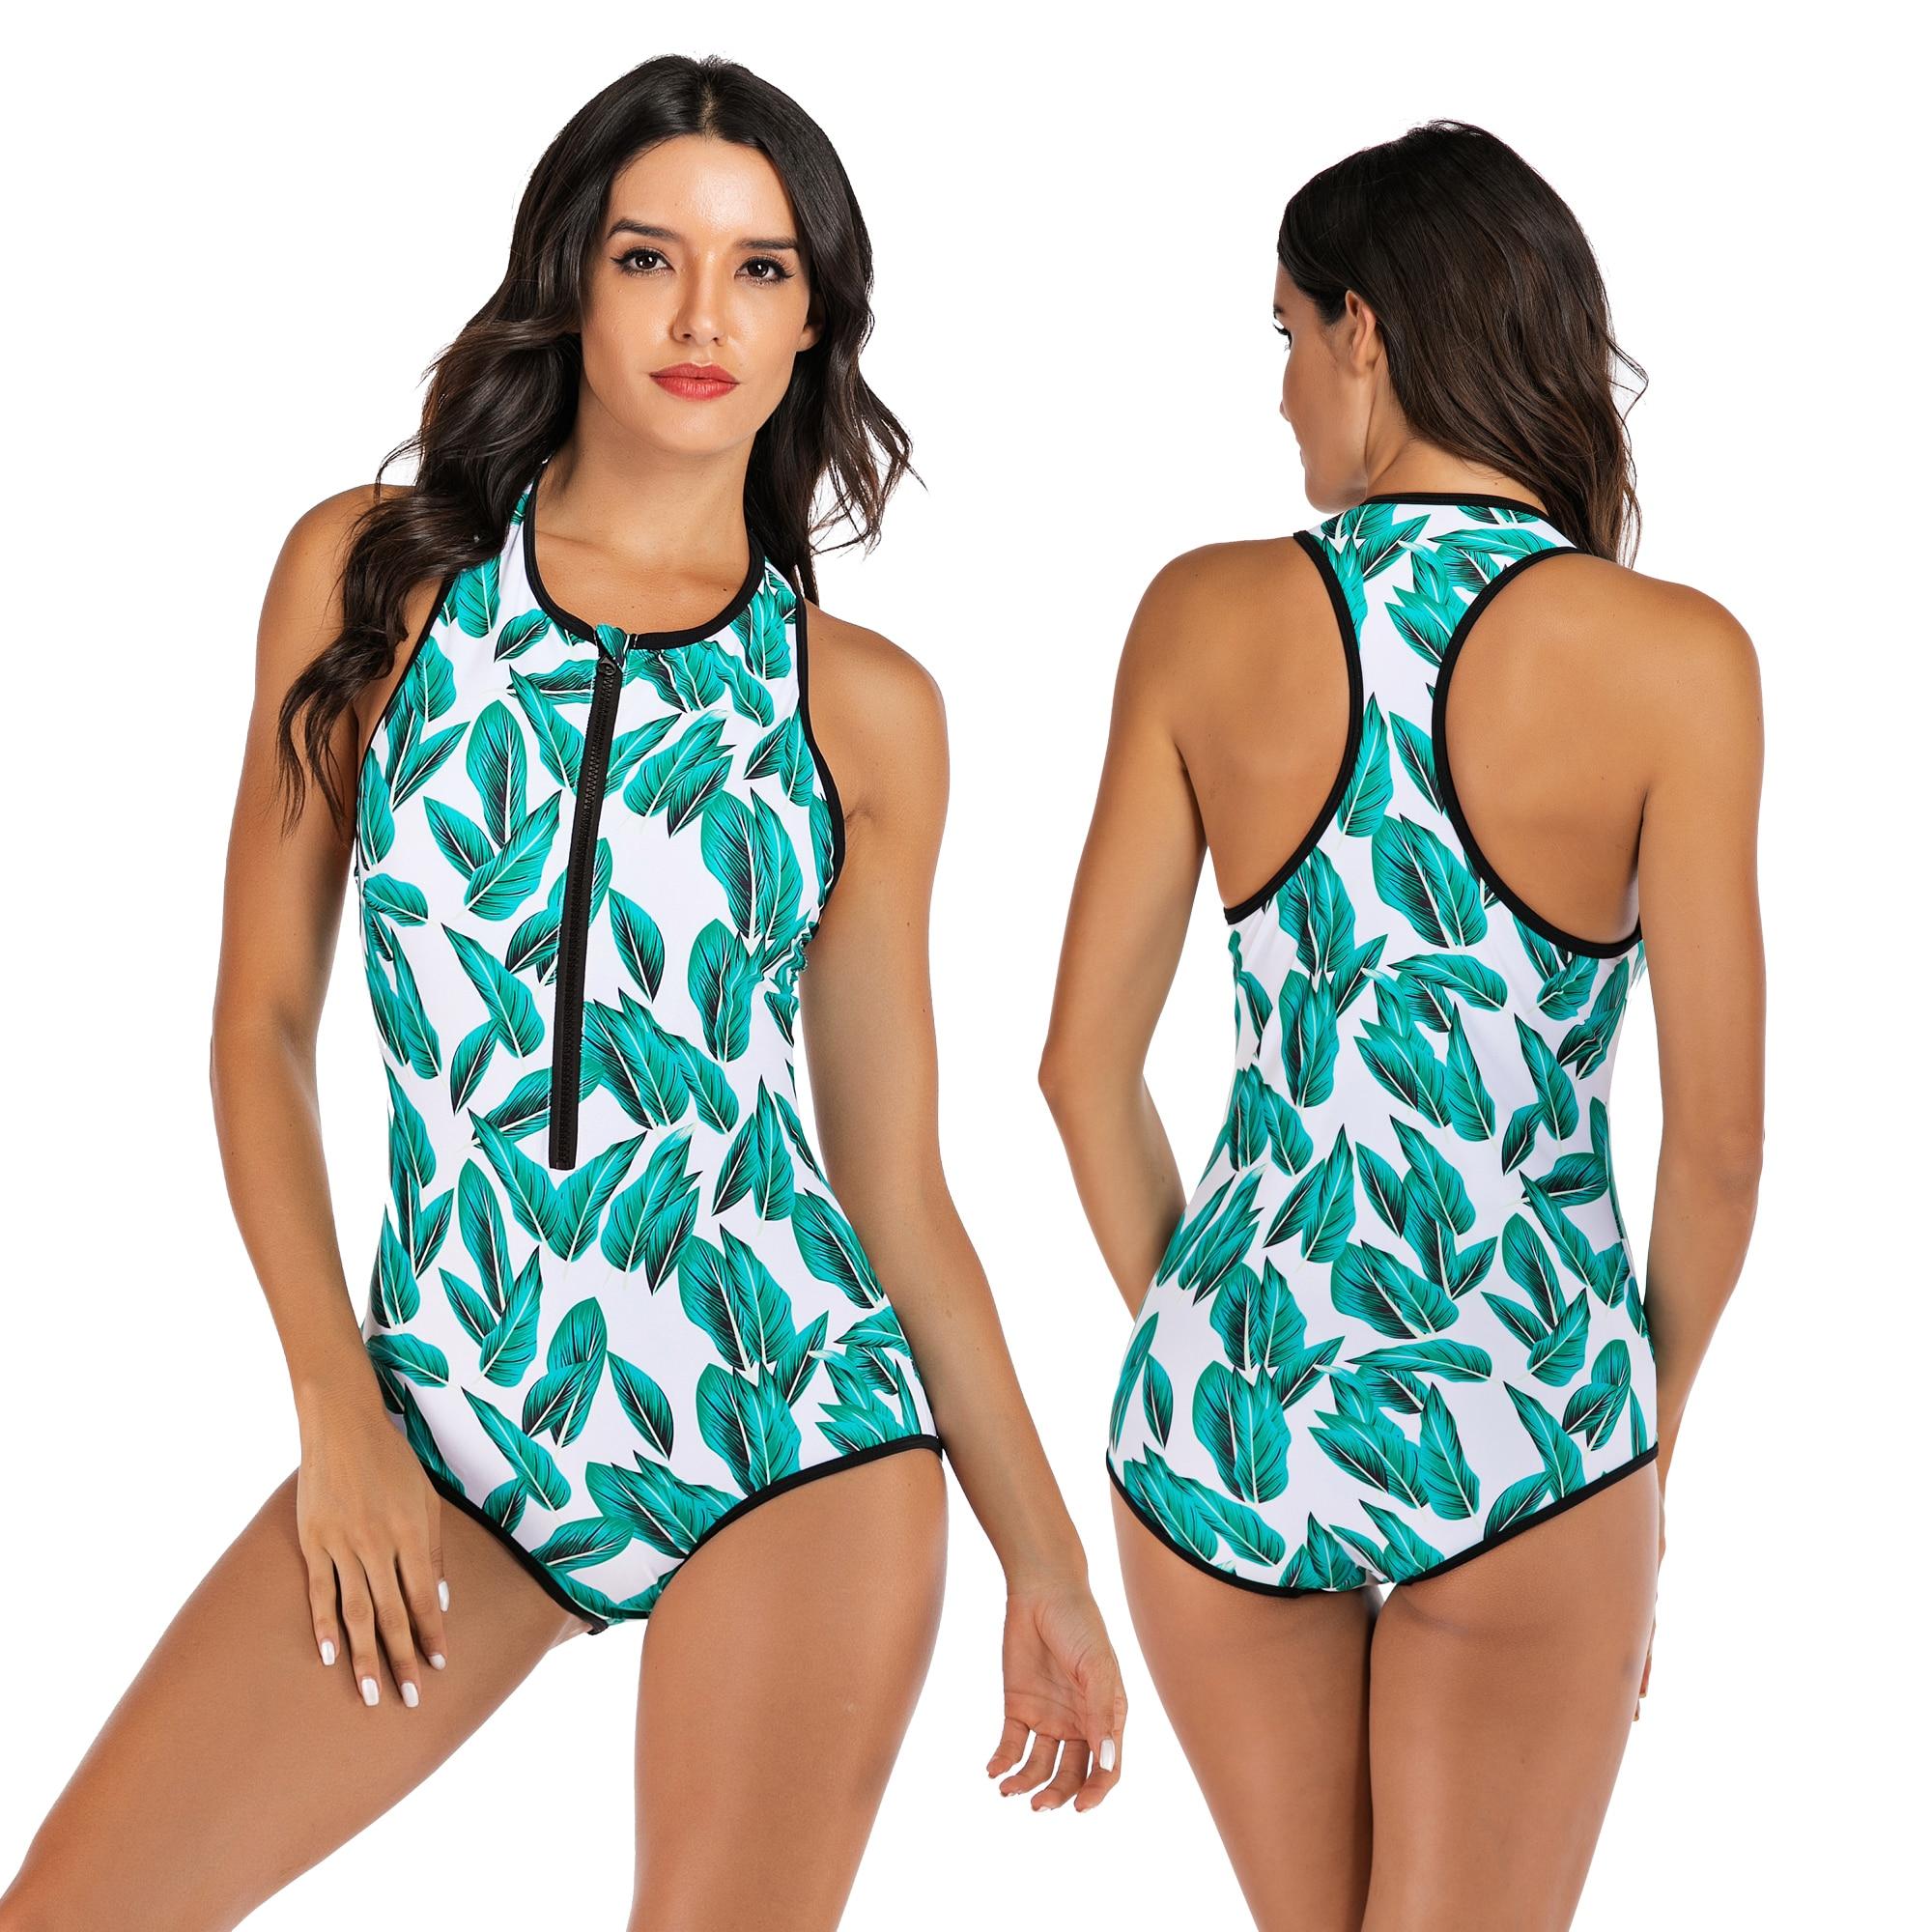 H64550c30e62b4609aad45c876ca08c04w Sexy Swimwear Women micro bikini mujer Swimsuit Women swimming suit Bikinis Set Vintage Beach biquinis feminino